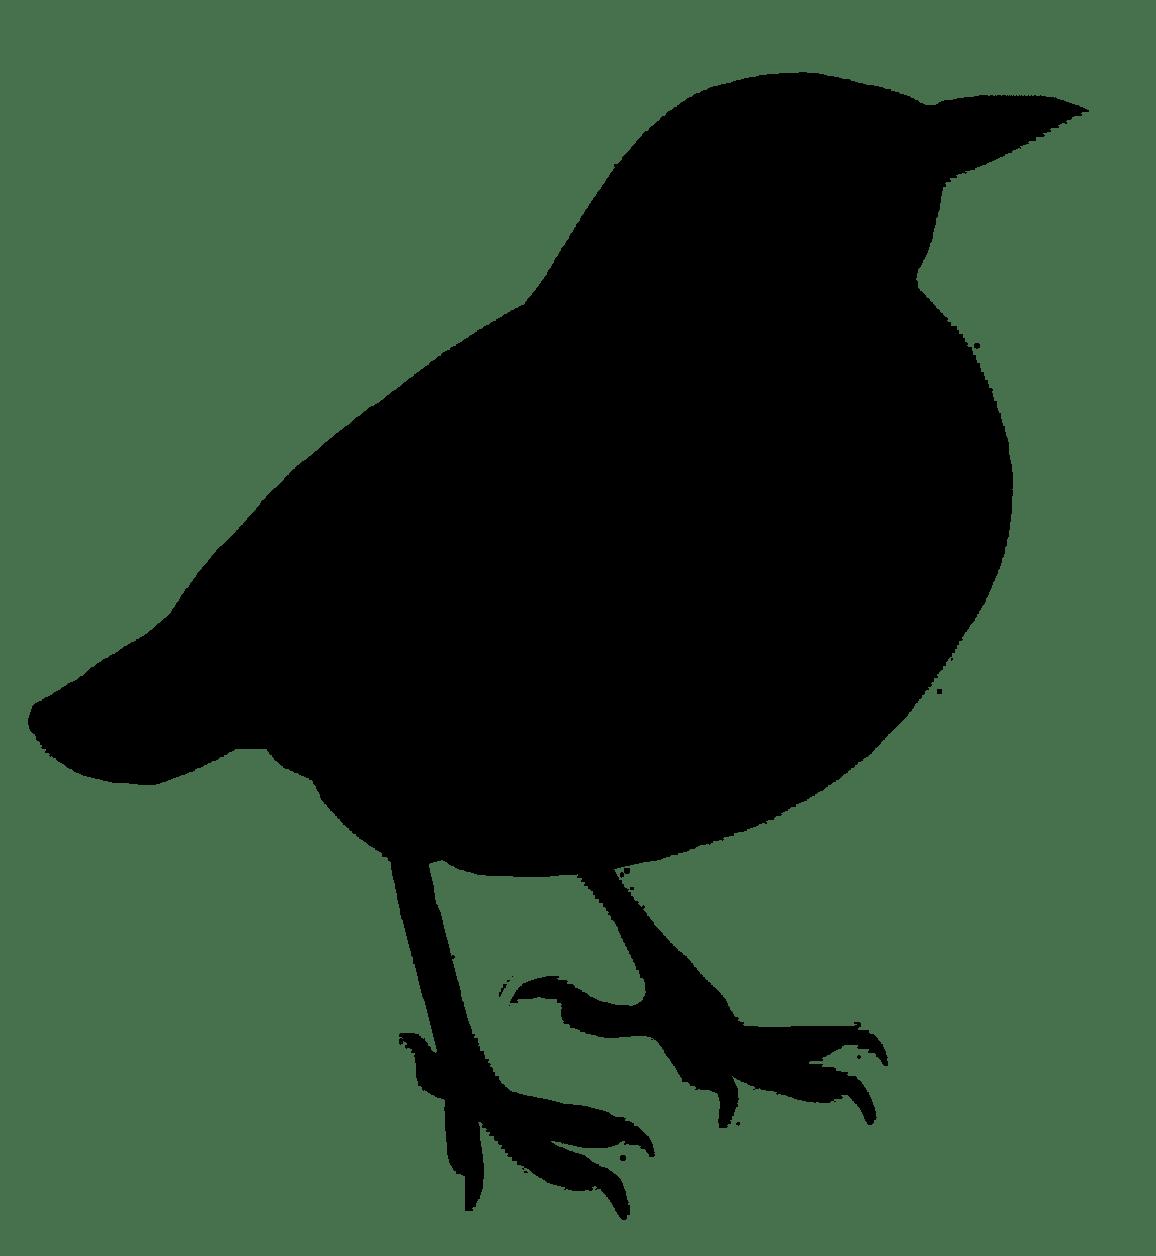 1156x1256 Bird Silhouette Clipart Transparent Png